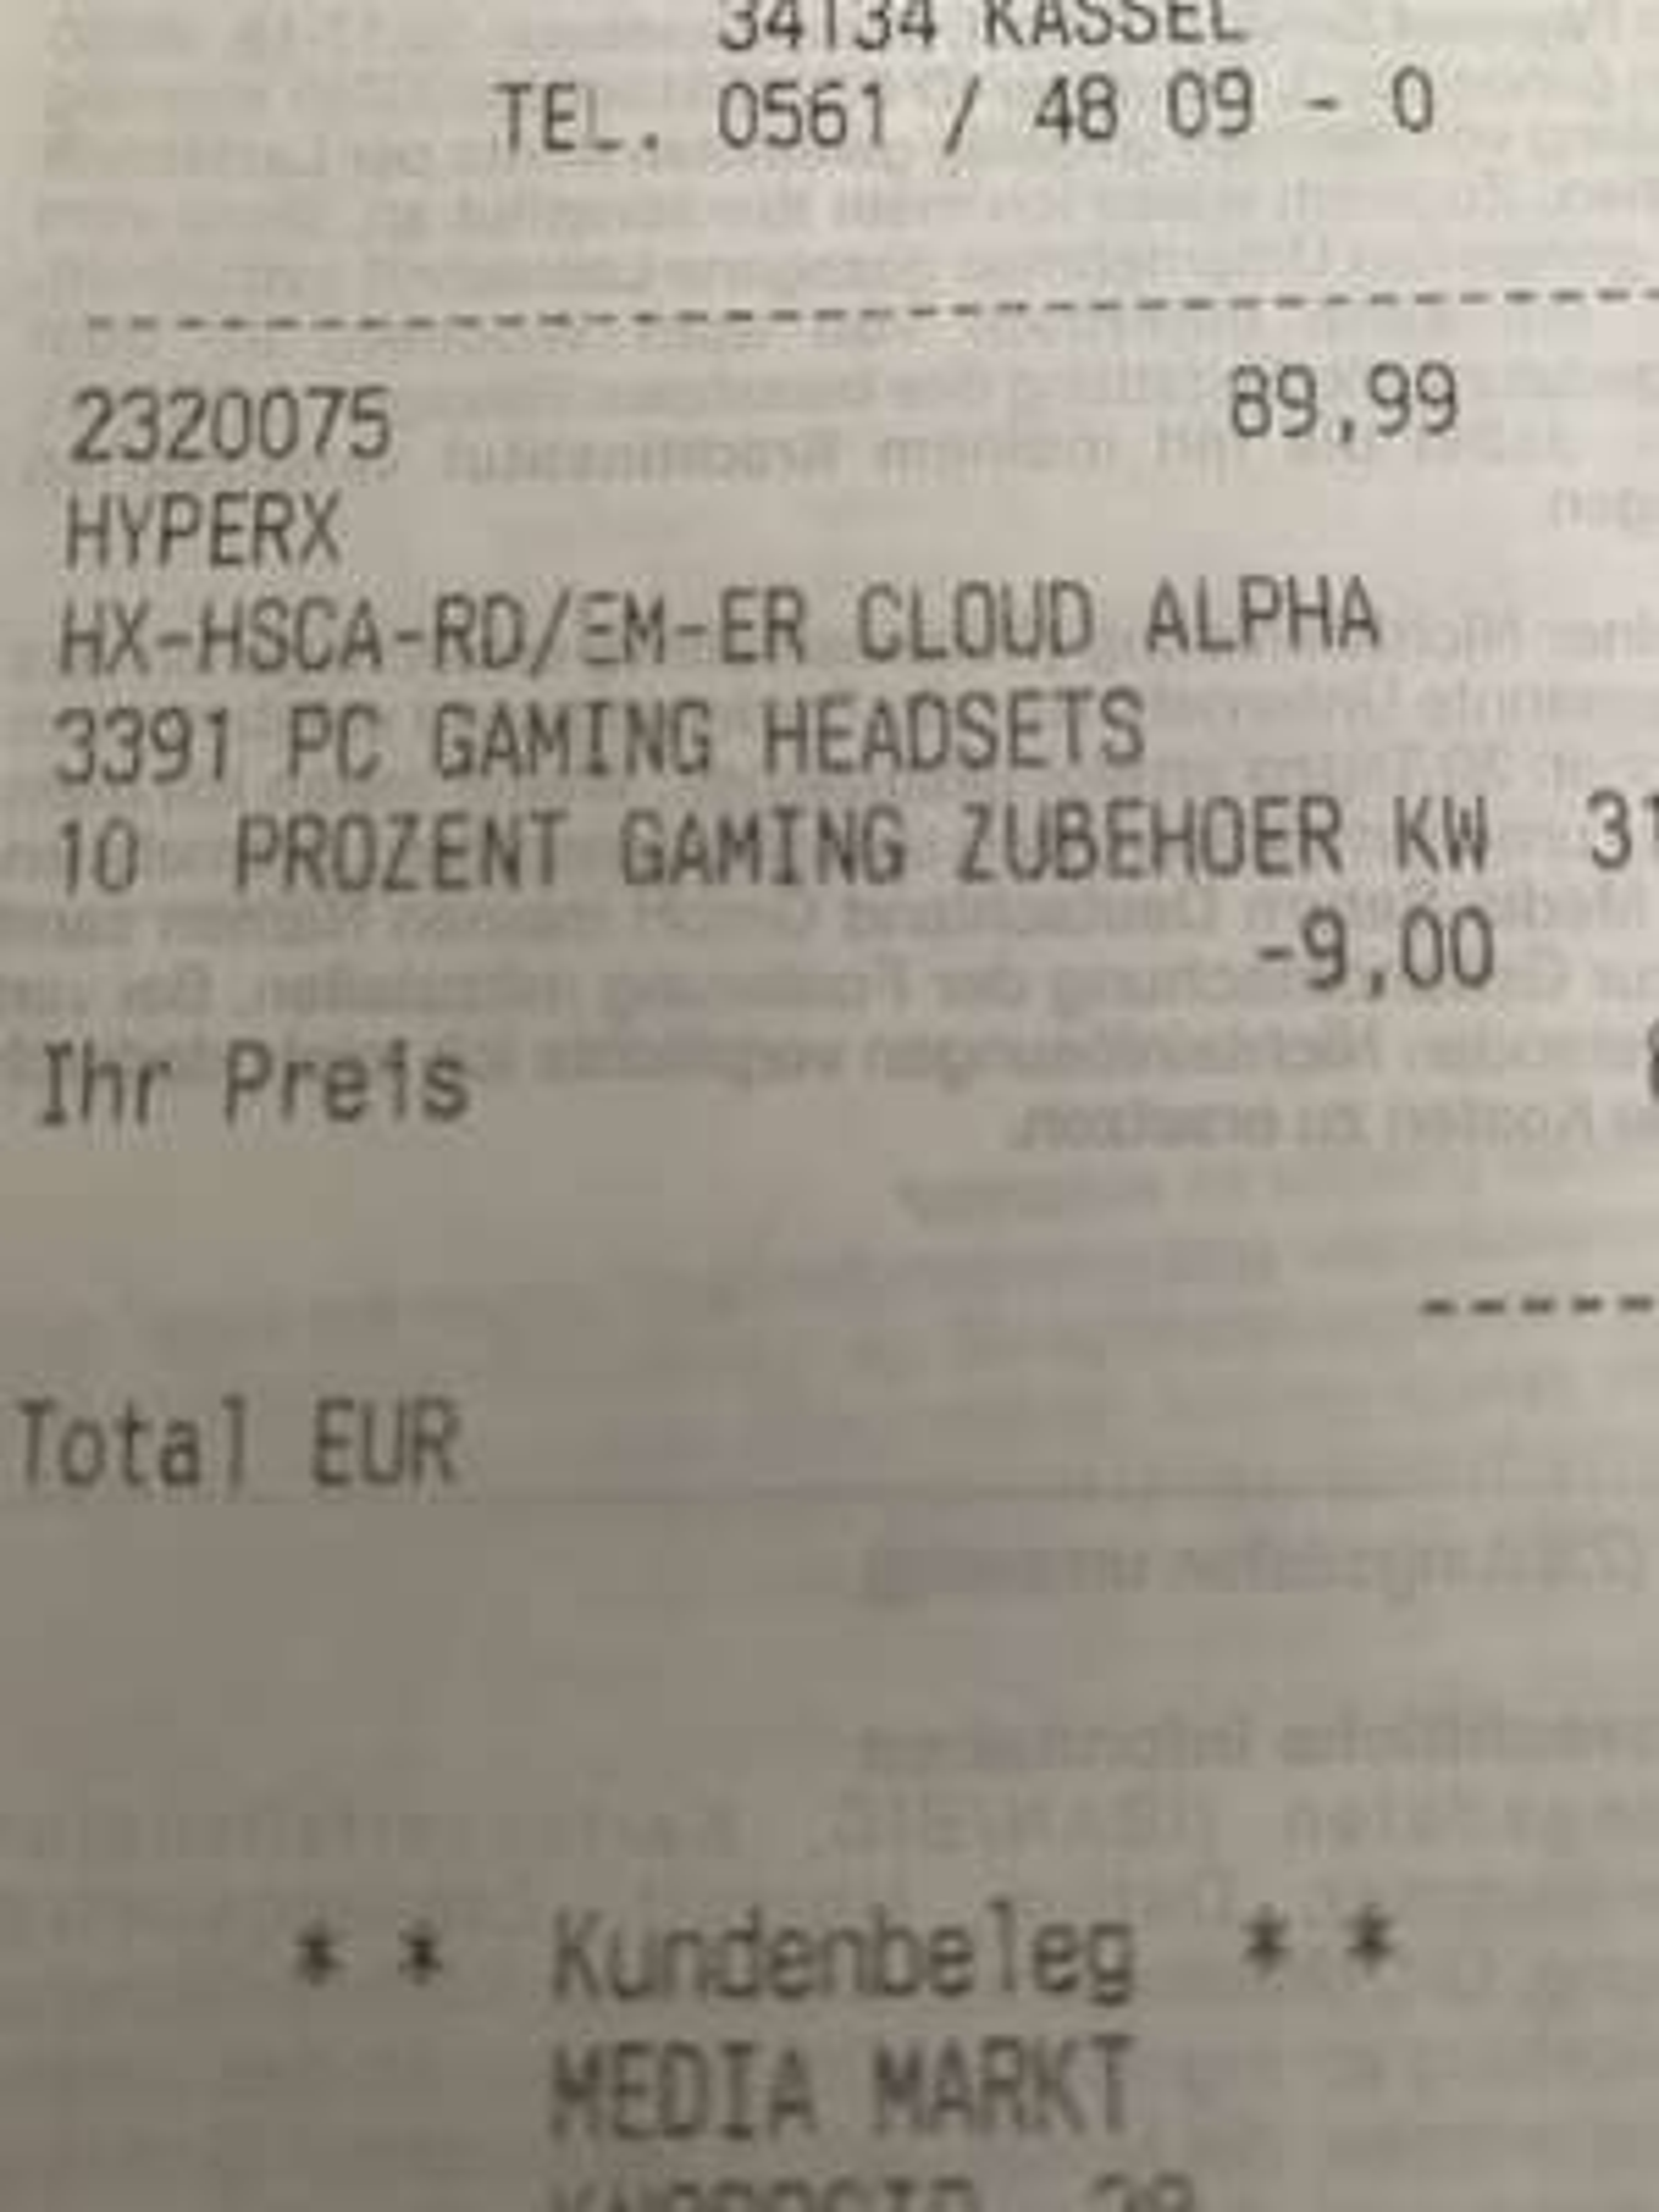 Mediamarkt 10% auf Gaming Artikel [Lokal? Kassel]